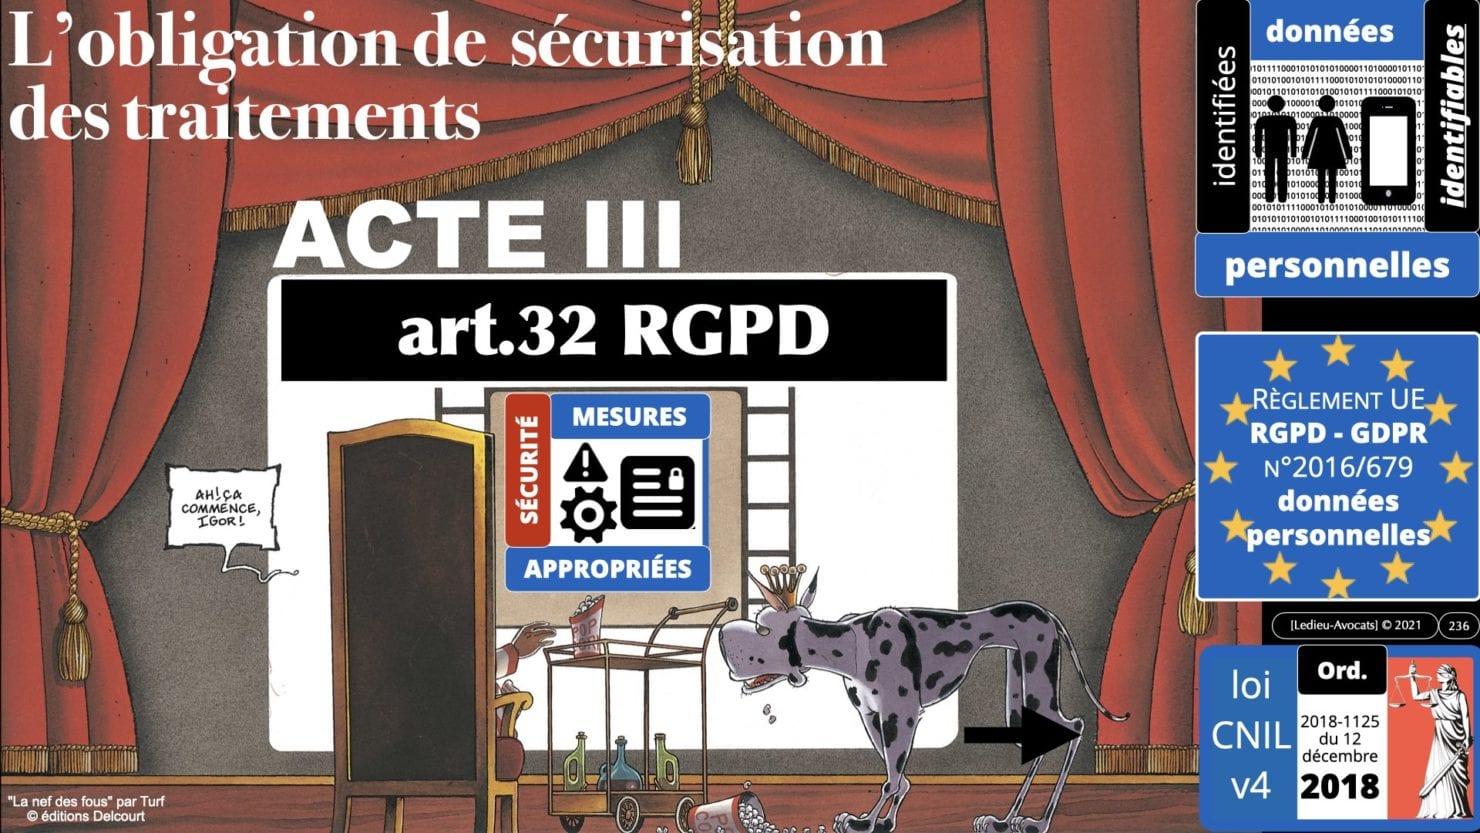 RGPD e-Privacy principes actualité jurisprudence ©Ledieu-Avocats 25-06-2021.236